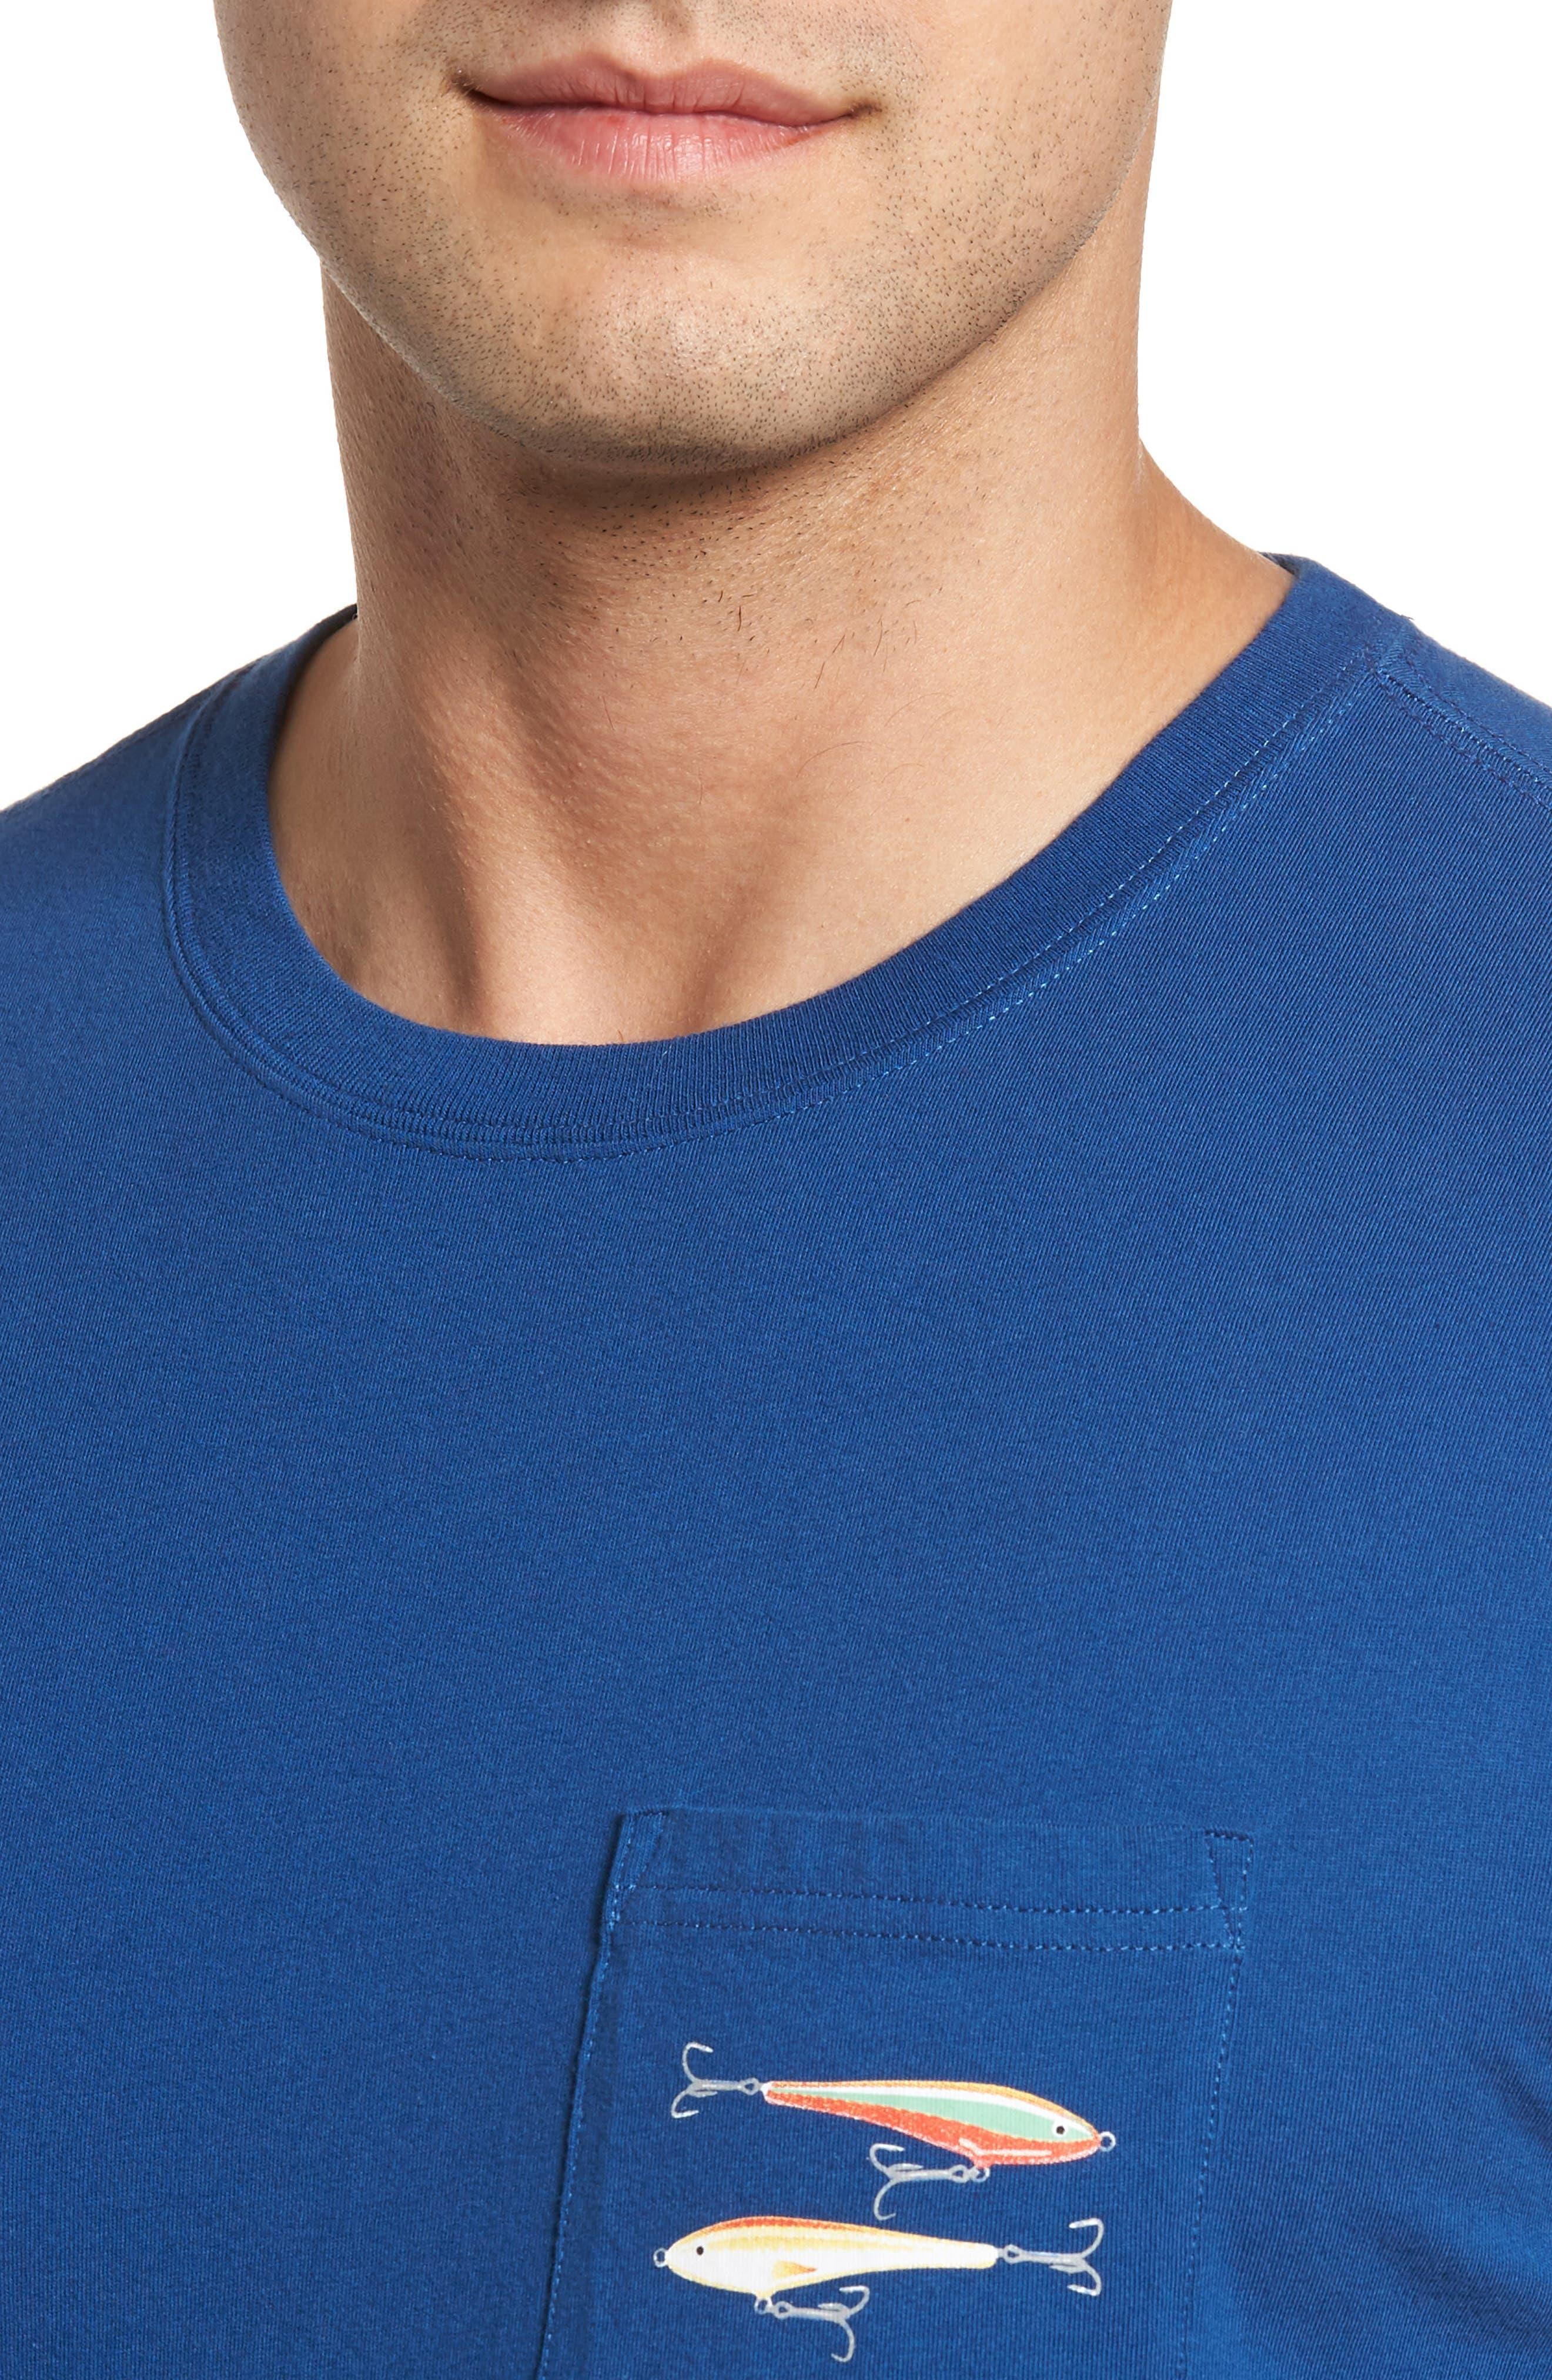 Hanging Out Regular Fit T-Shirt,                             Alternate thumbnail 4, color,                             Blue Lake